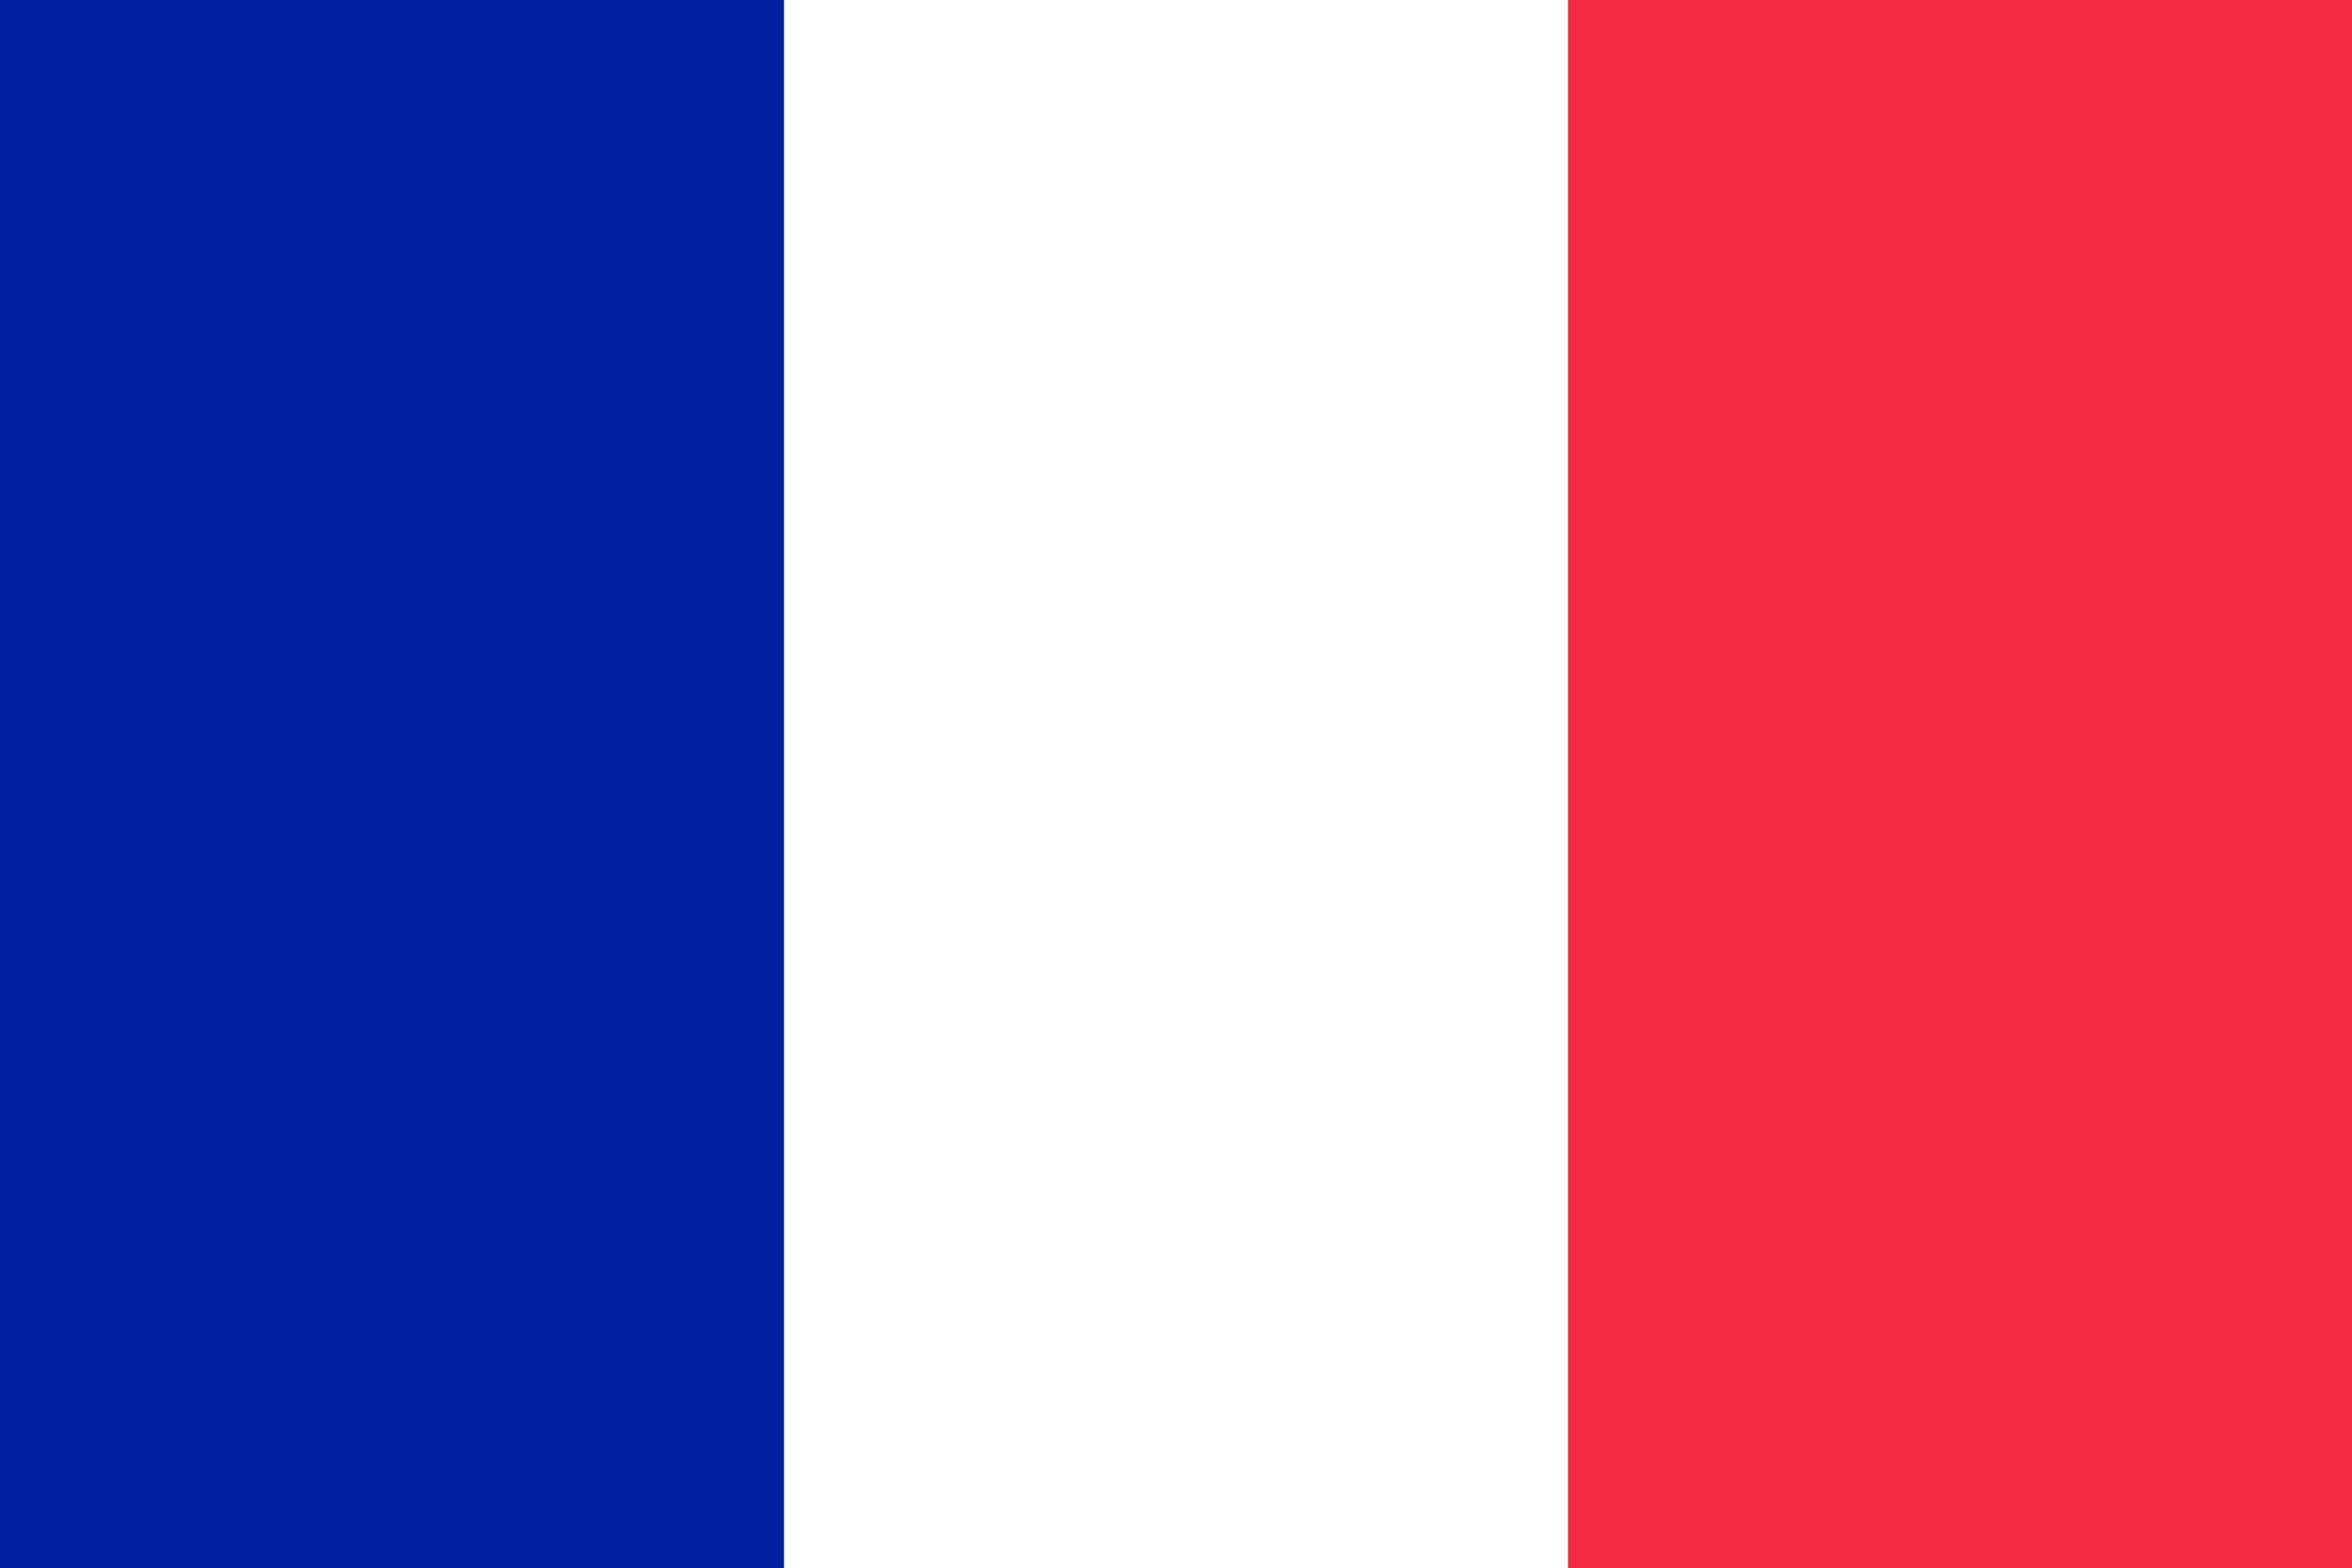 Francia, paese, emblema, logo, simbolo - Sfondi HD - Professor-falken.com